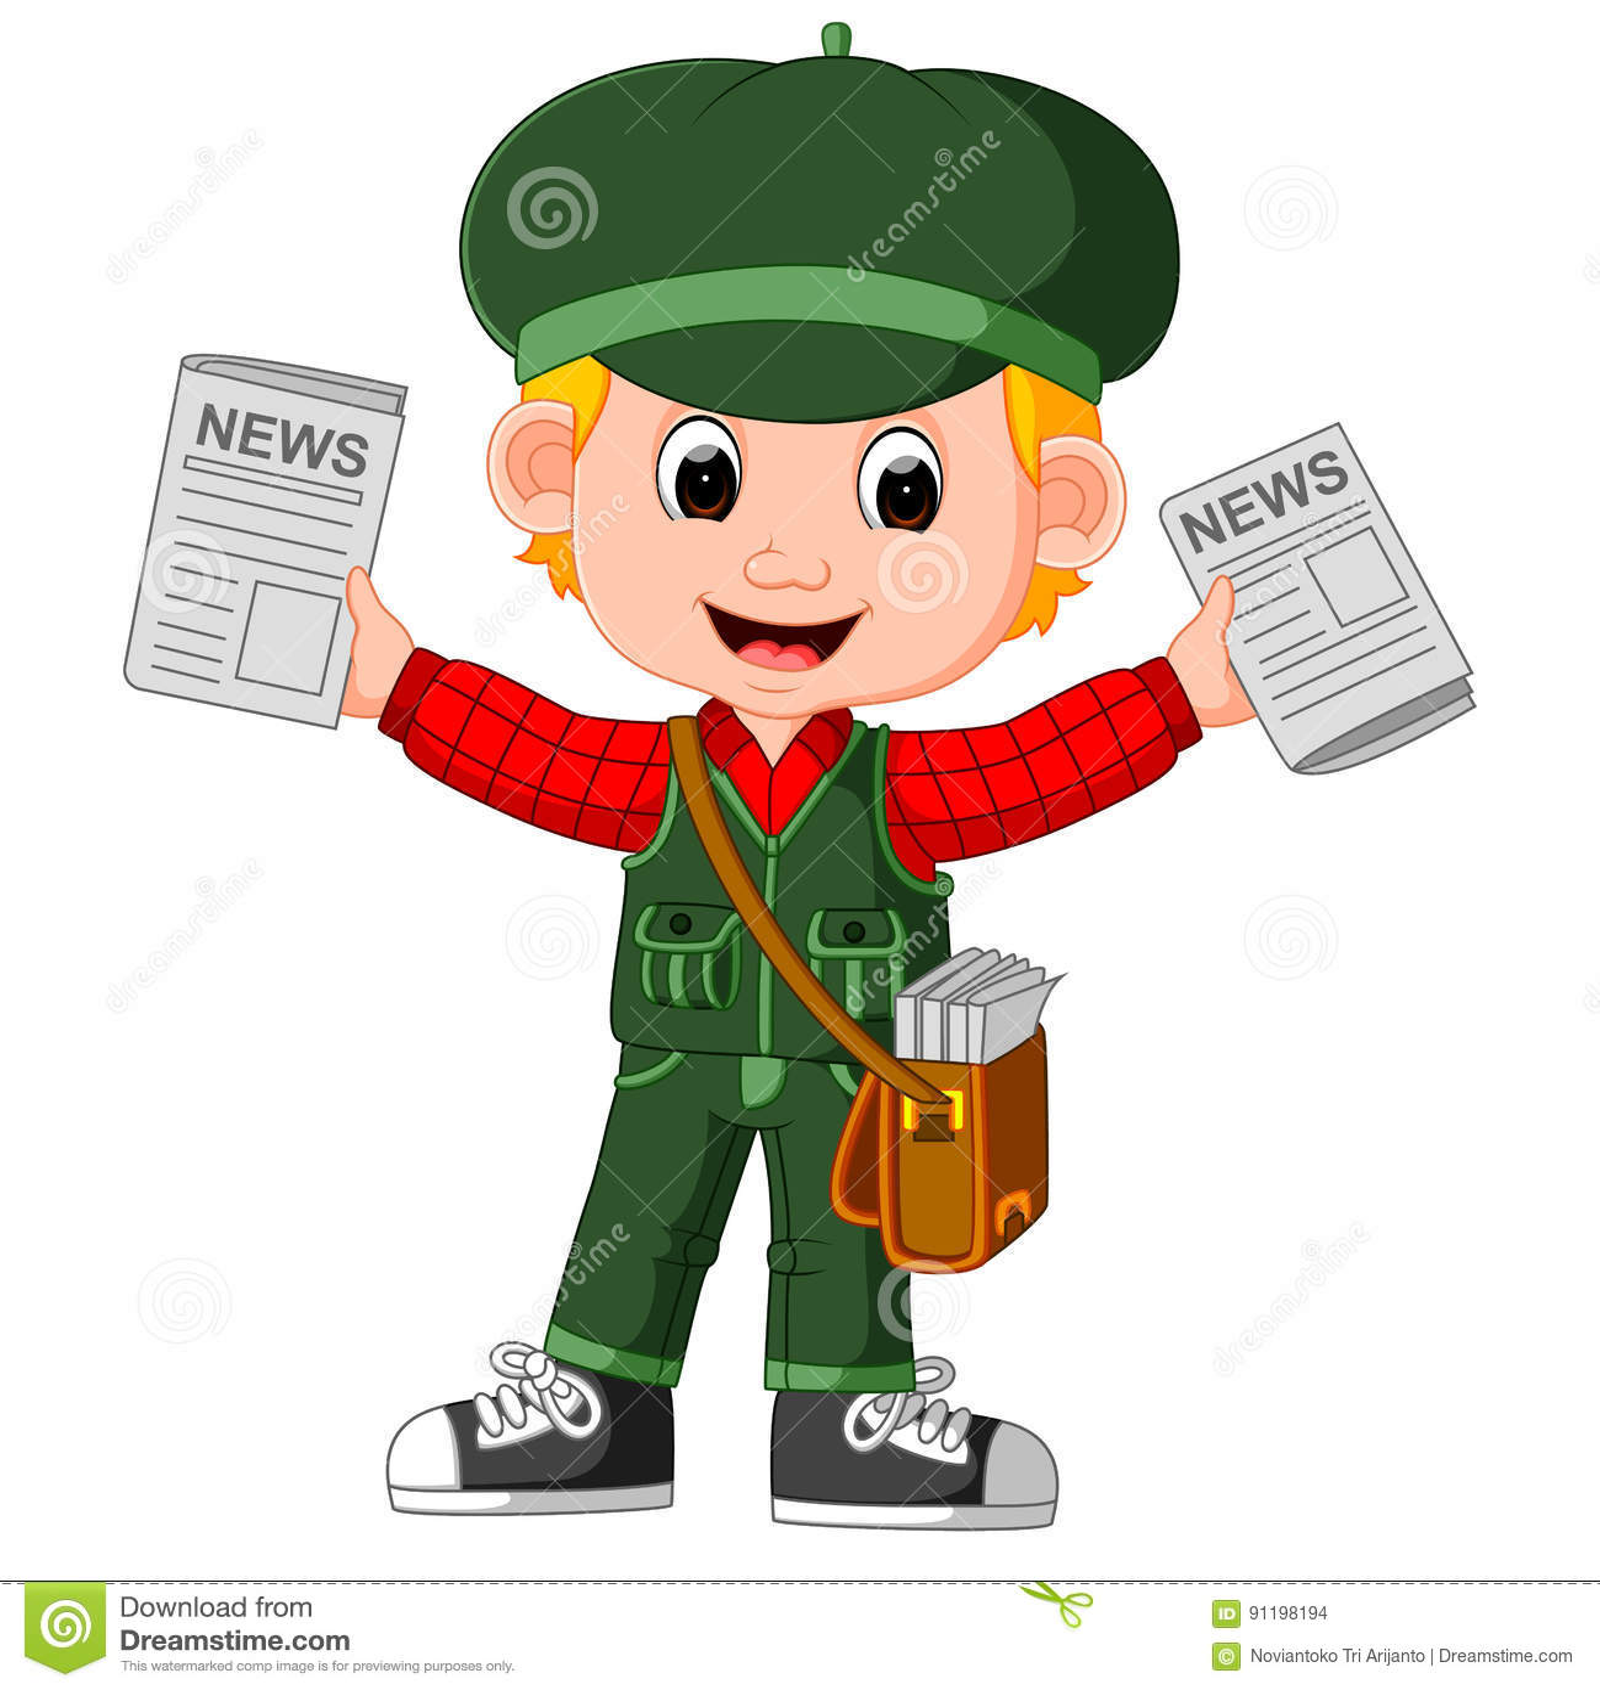 newspaper boy stock illustrations – 544 newspaper boy stock